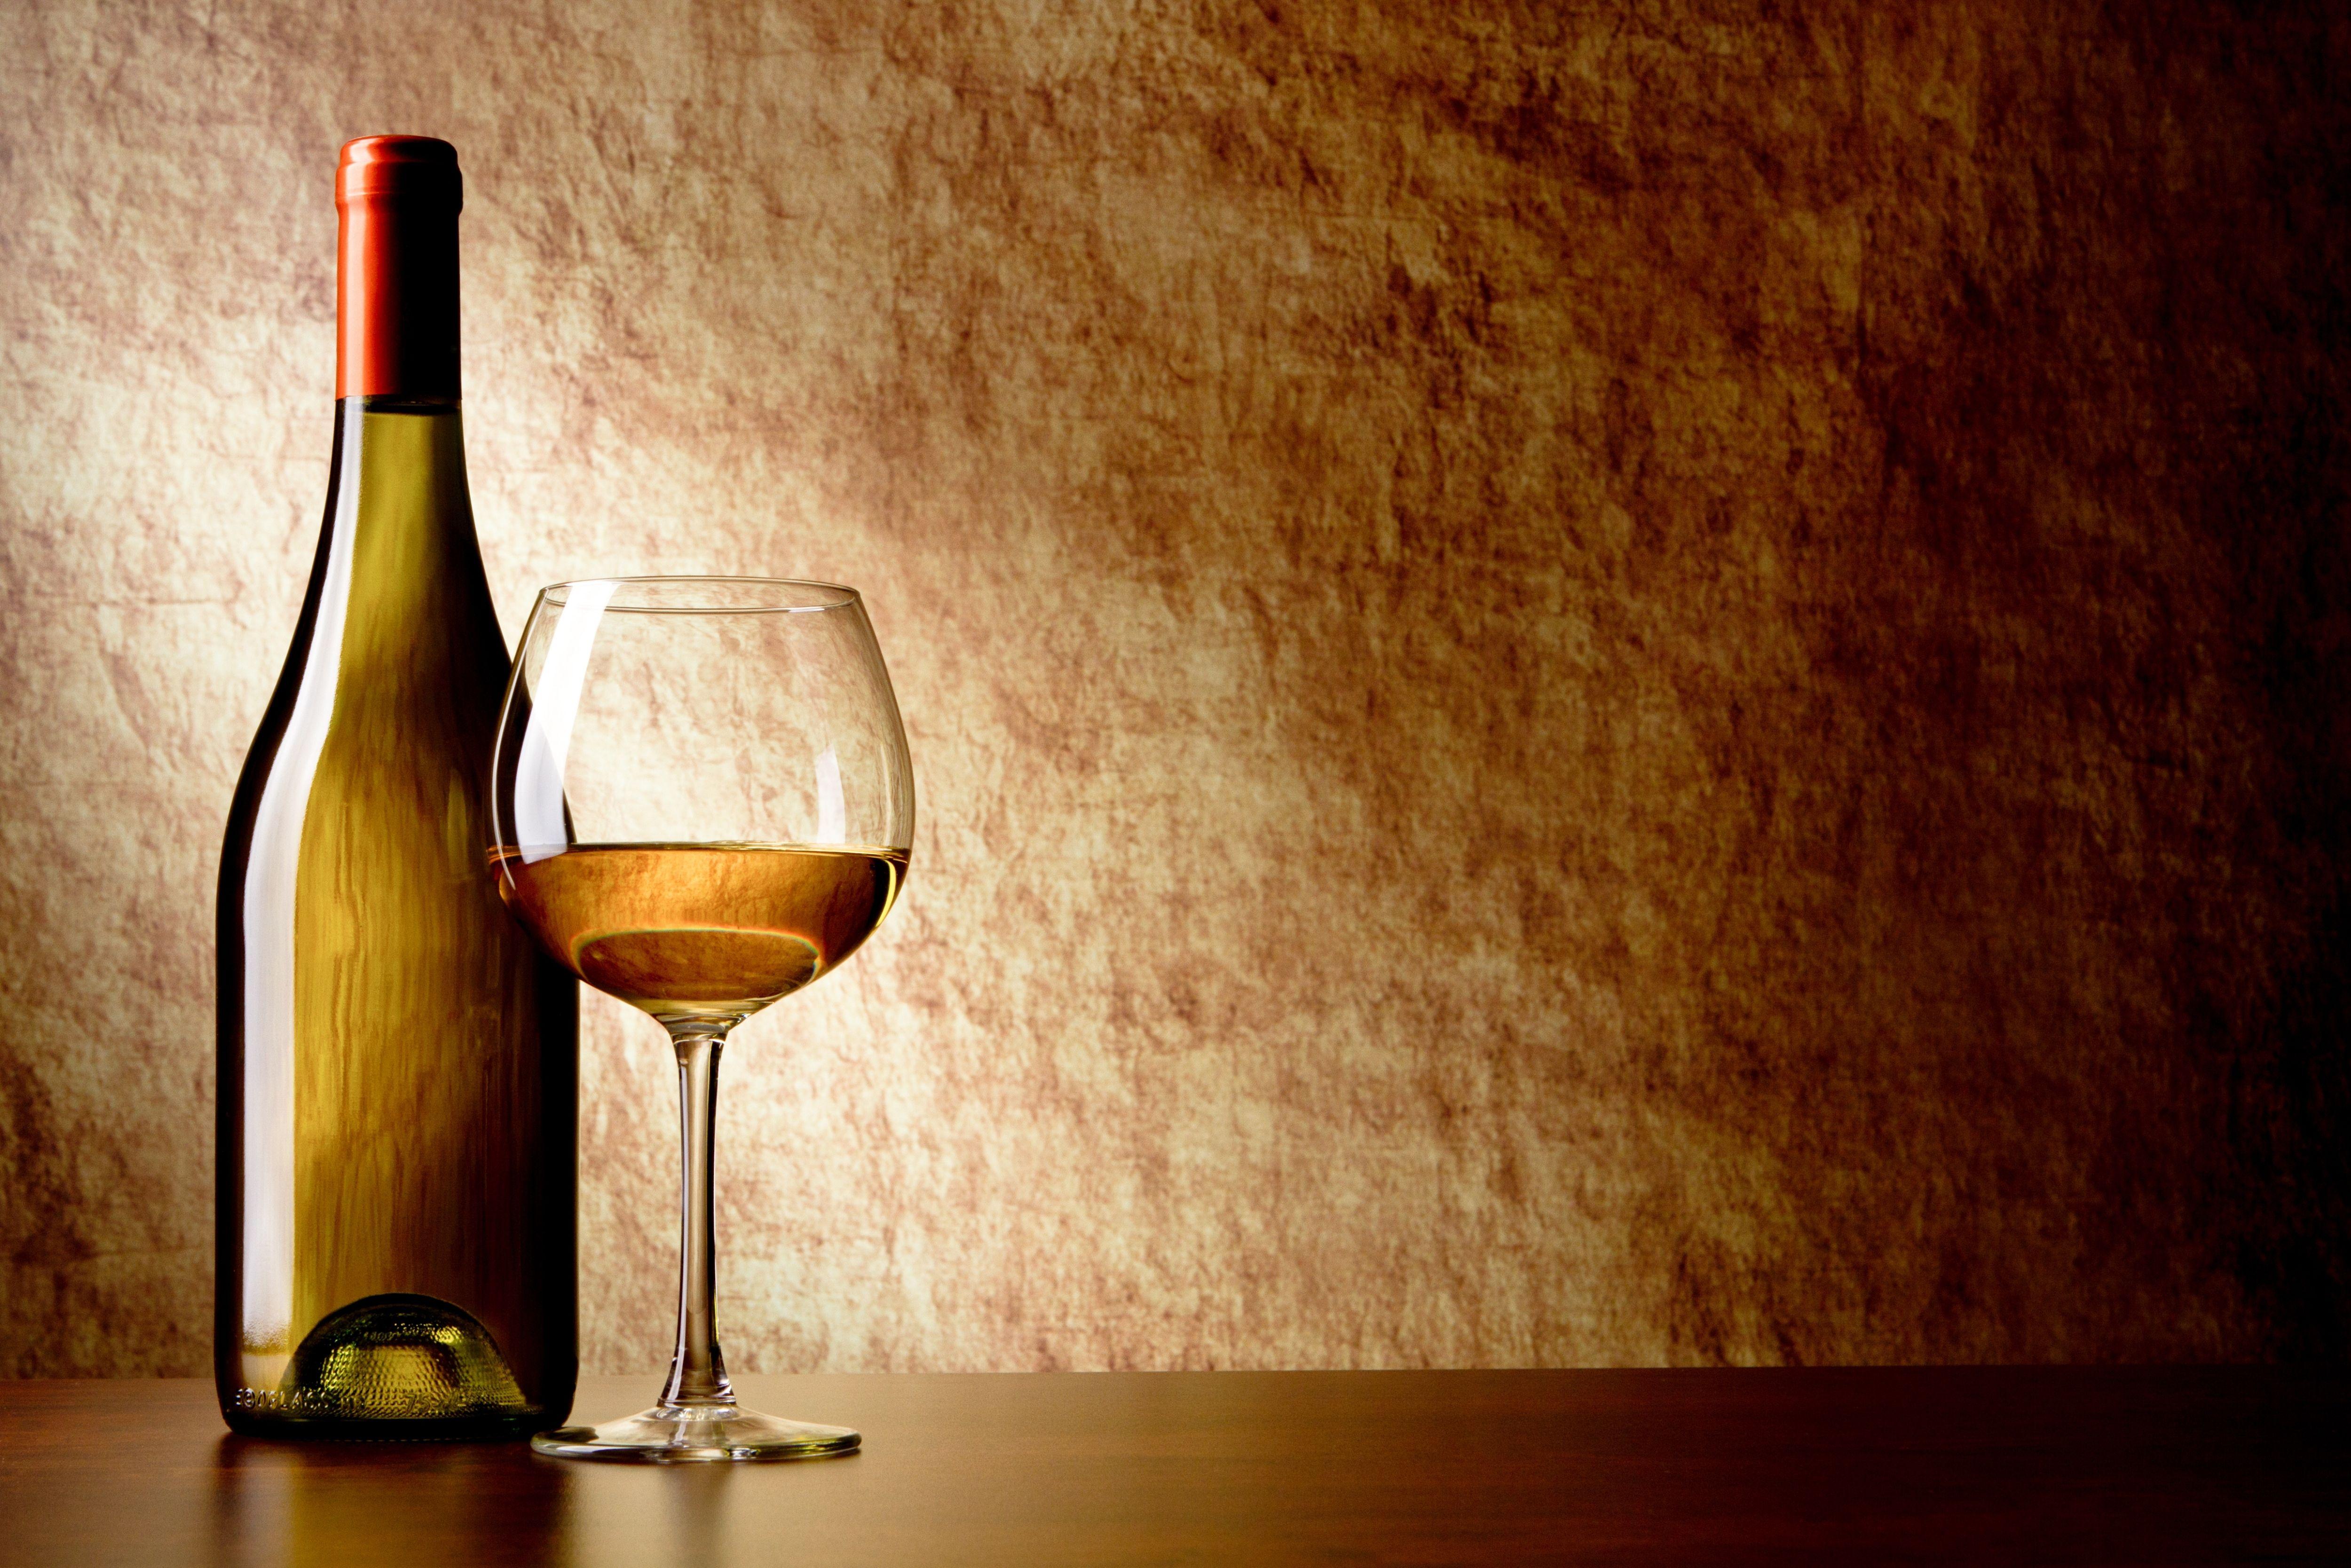 Check Out This Behance Project Bar Restaurant Wine Shop Find App Design Https Www Behance Net Gallery 36303791 Barresta Wine Wallpaper Wine White Wine